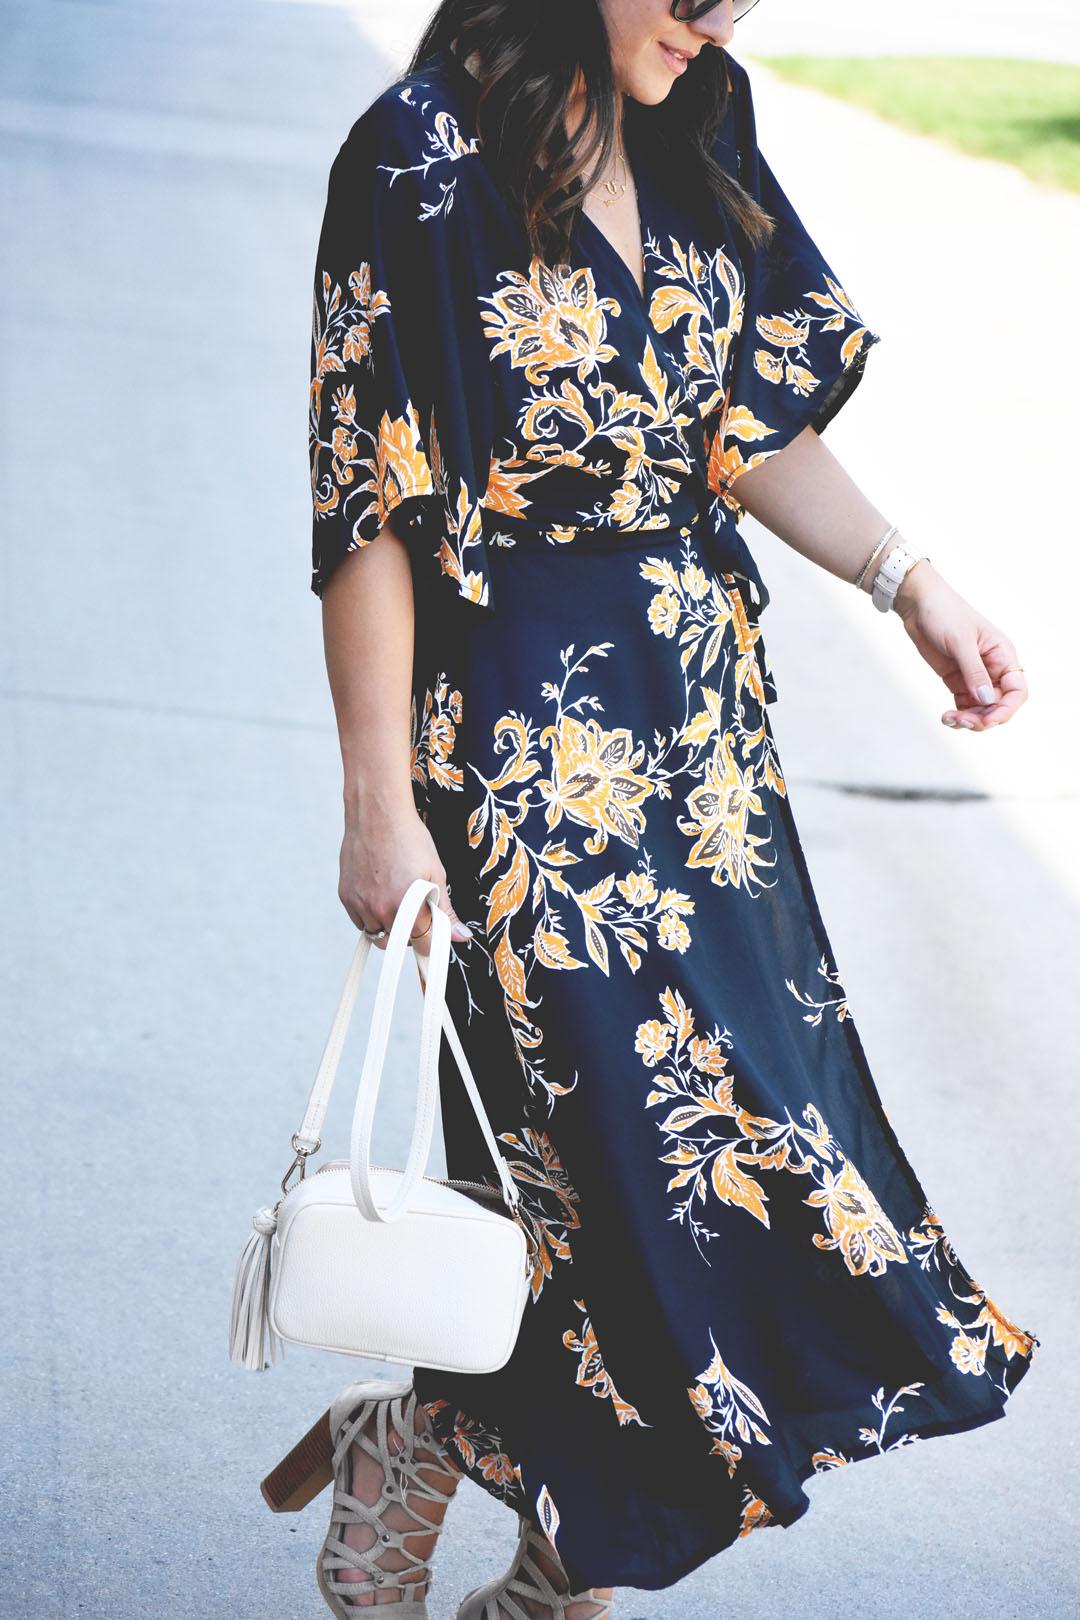 Carolina Hellal wearing a floral maxi dress and h&m beige crossbody bag.